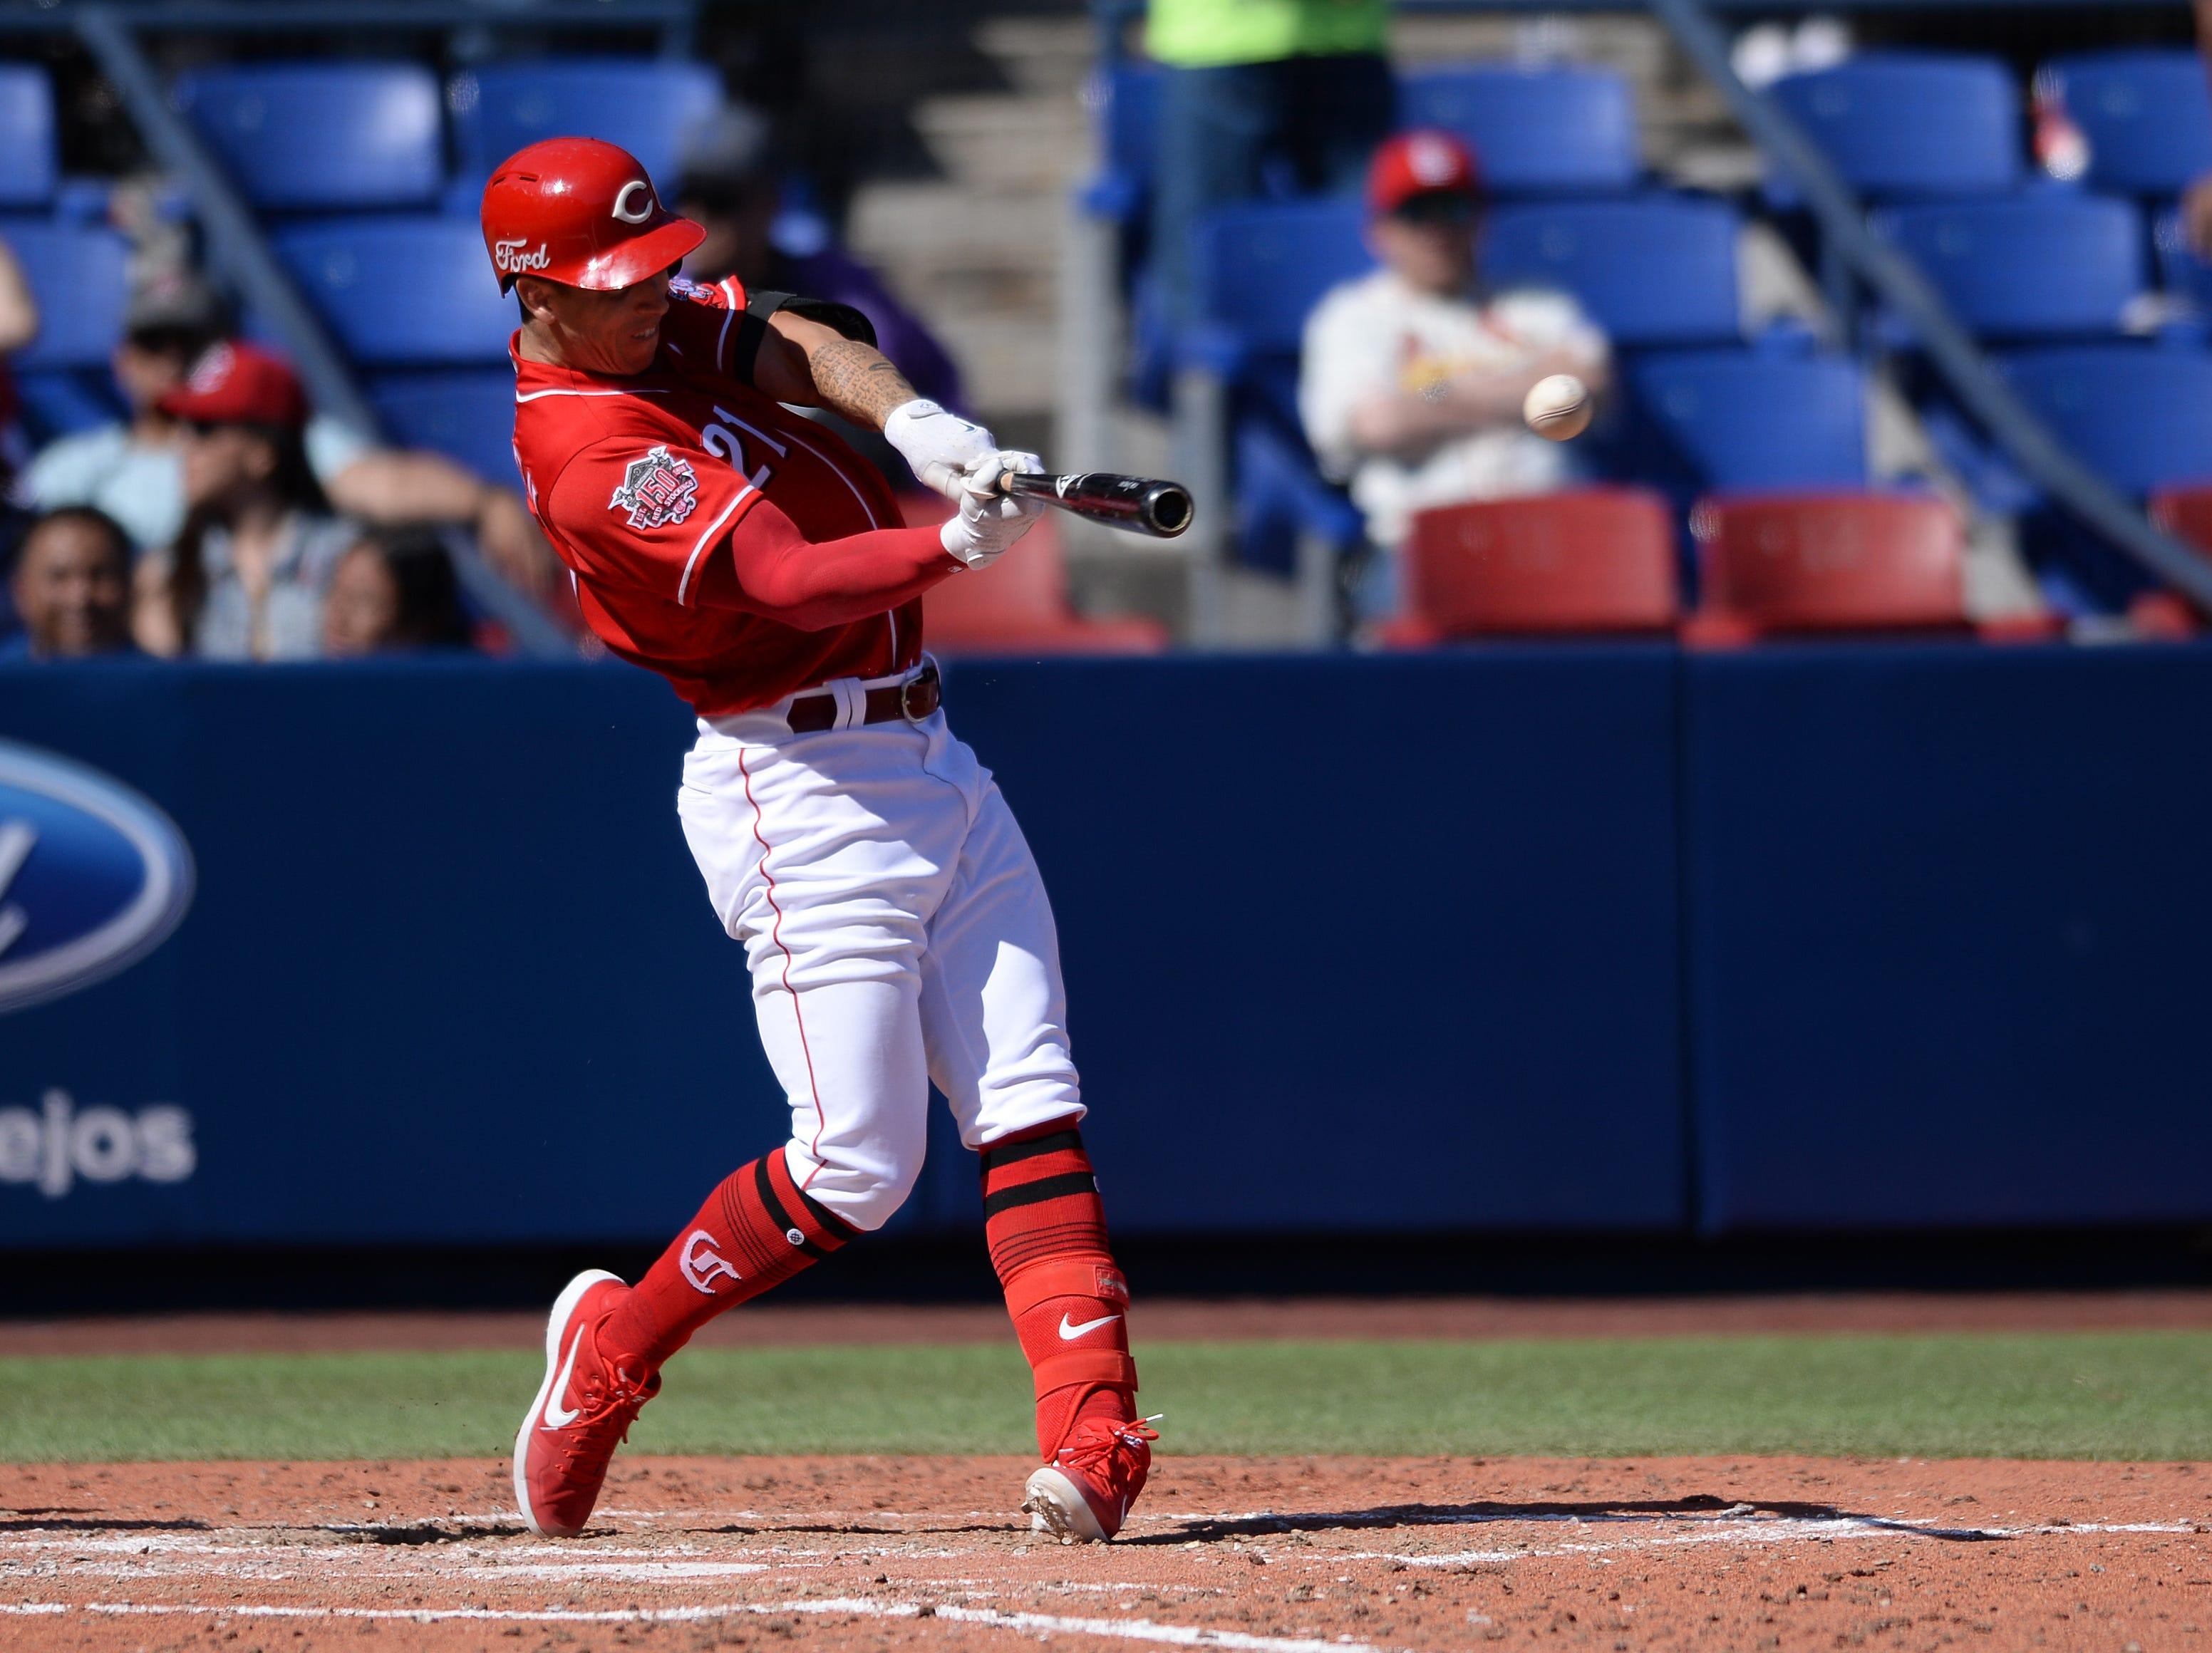 Cincinnati Reds relief pitcher Michael Lorenzen (21) hits an RBI double during the fifth inning against the St. Louis Cardinals at Estadio de Beisbol Monterrey.